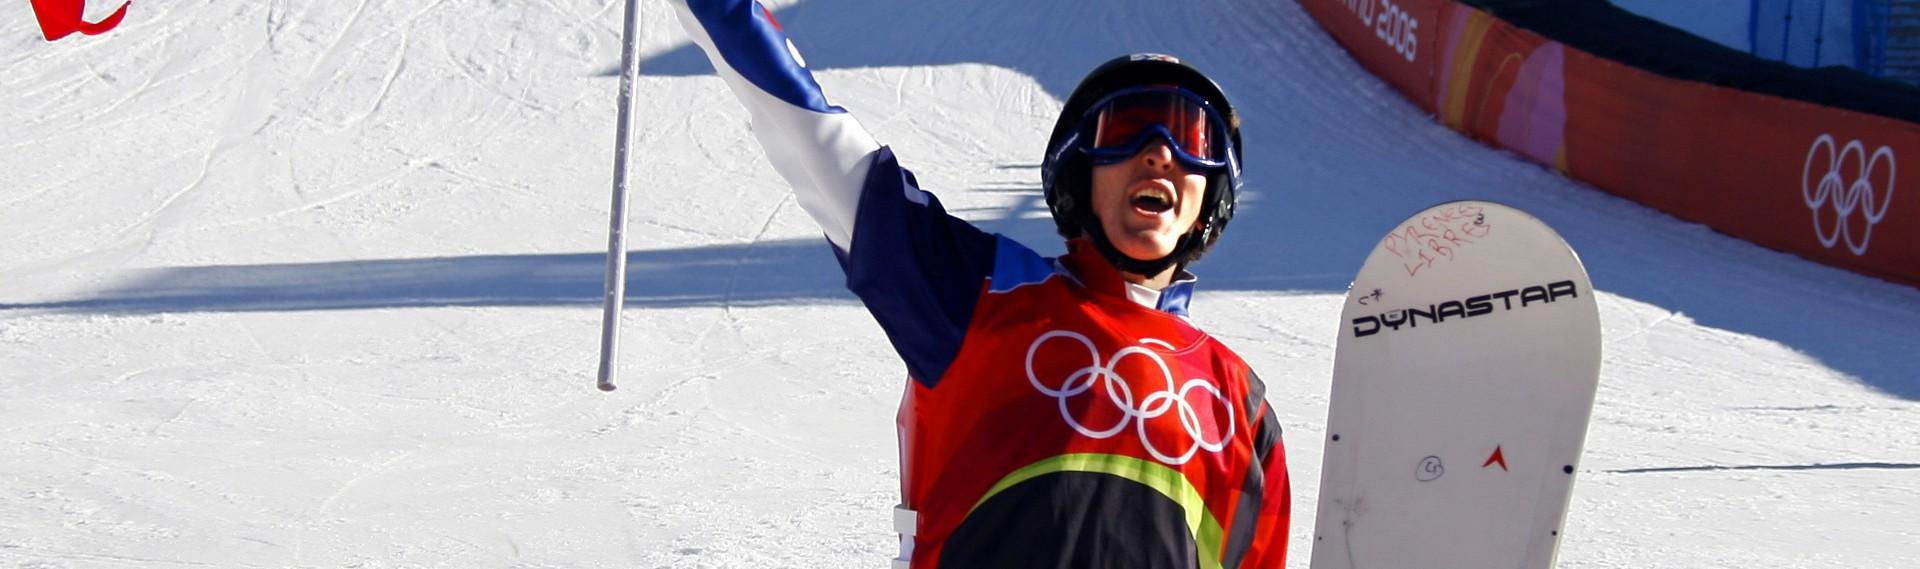 Paul-Henri de Le Rue, Snowboarder, ambassadeur Kazaden